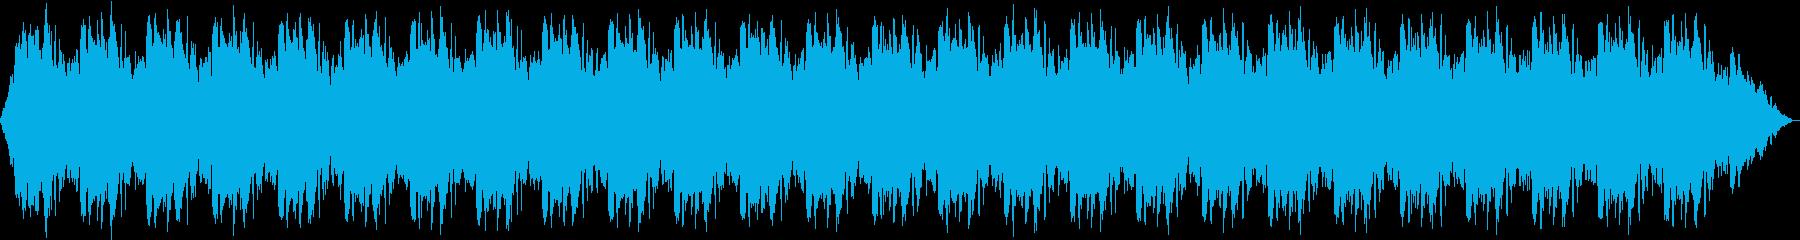 魔法詠唱、魔法発動、独白 10の再生済みの波形